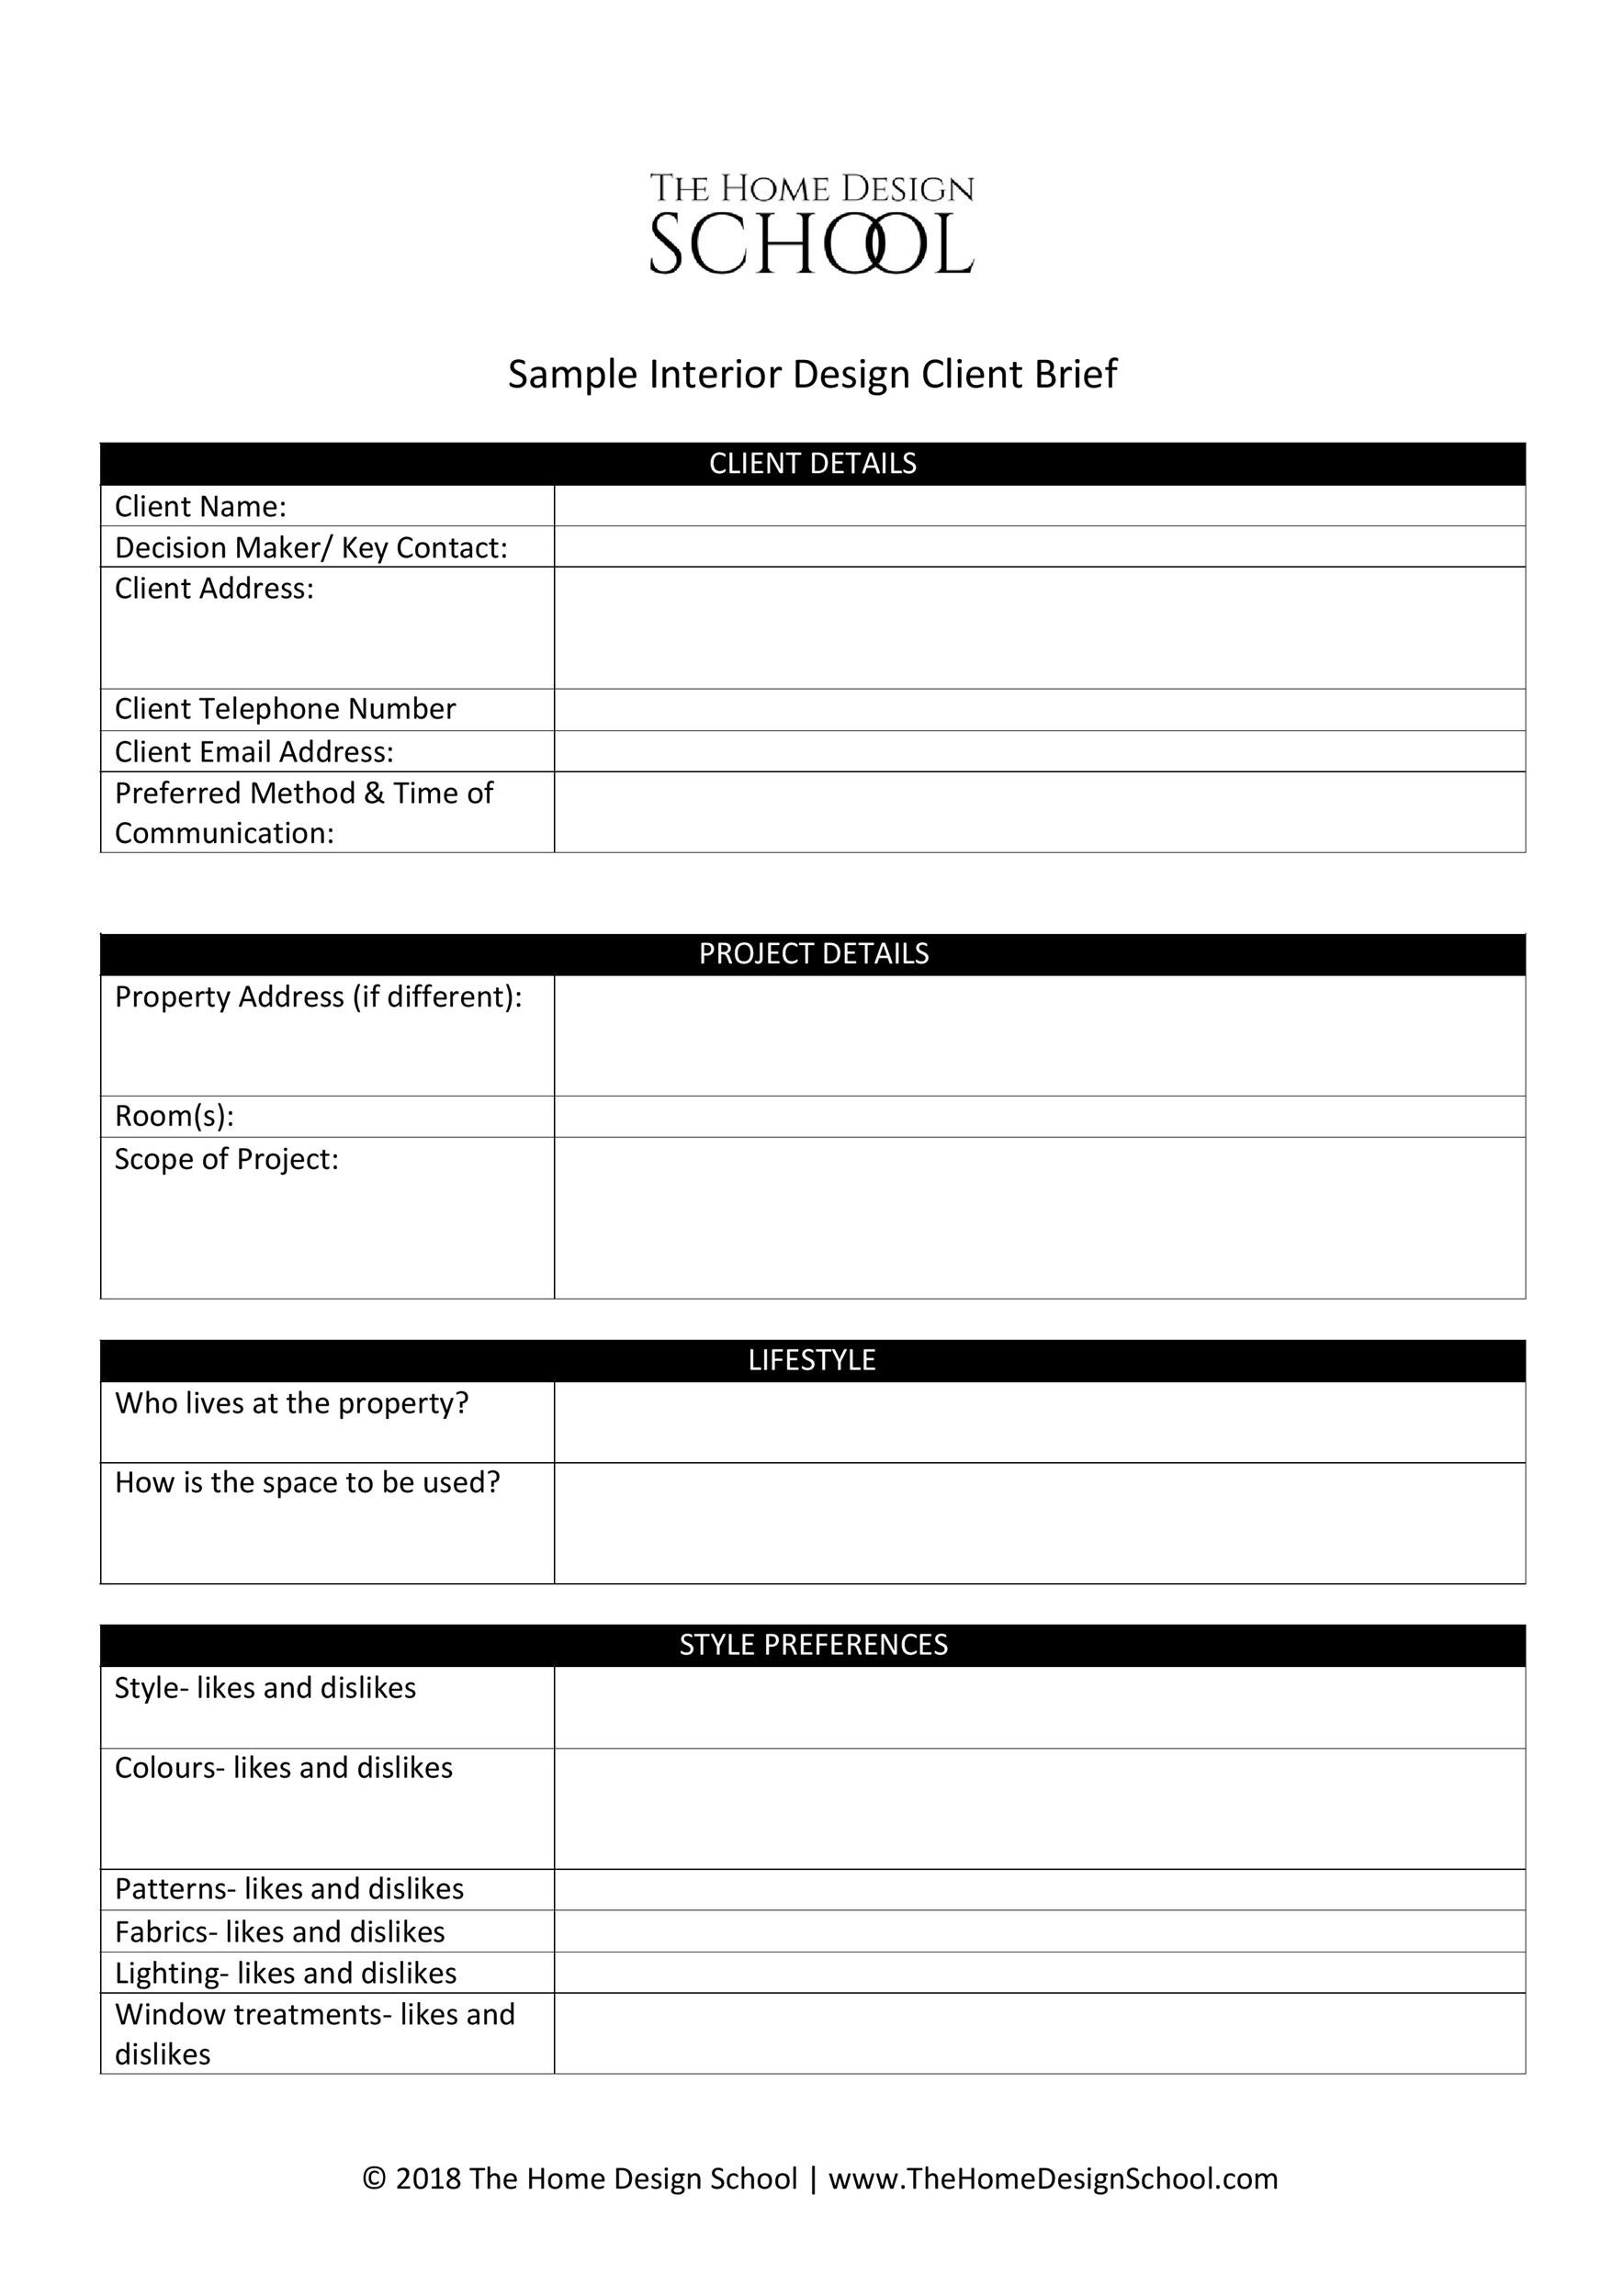 50 Useful Design Brief Templates Free Creative Brief ᐅ Templatelab